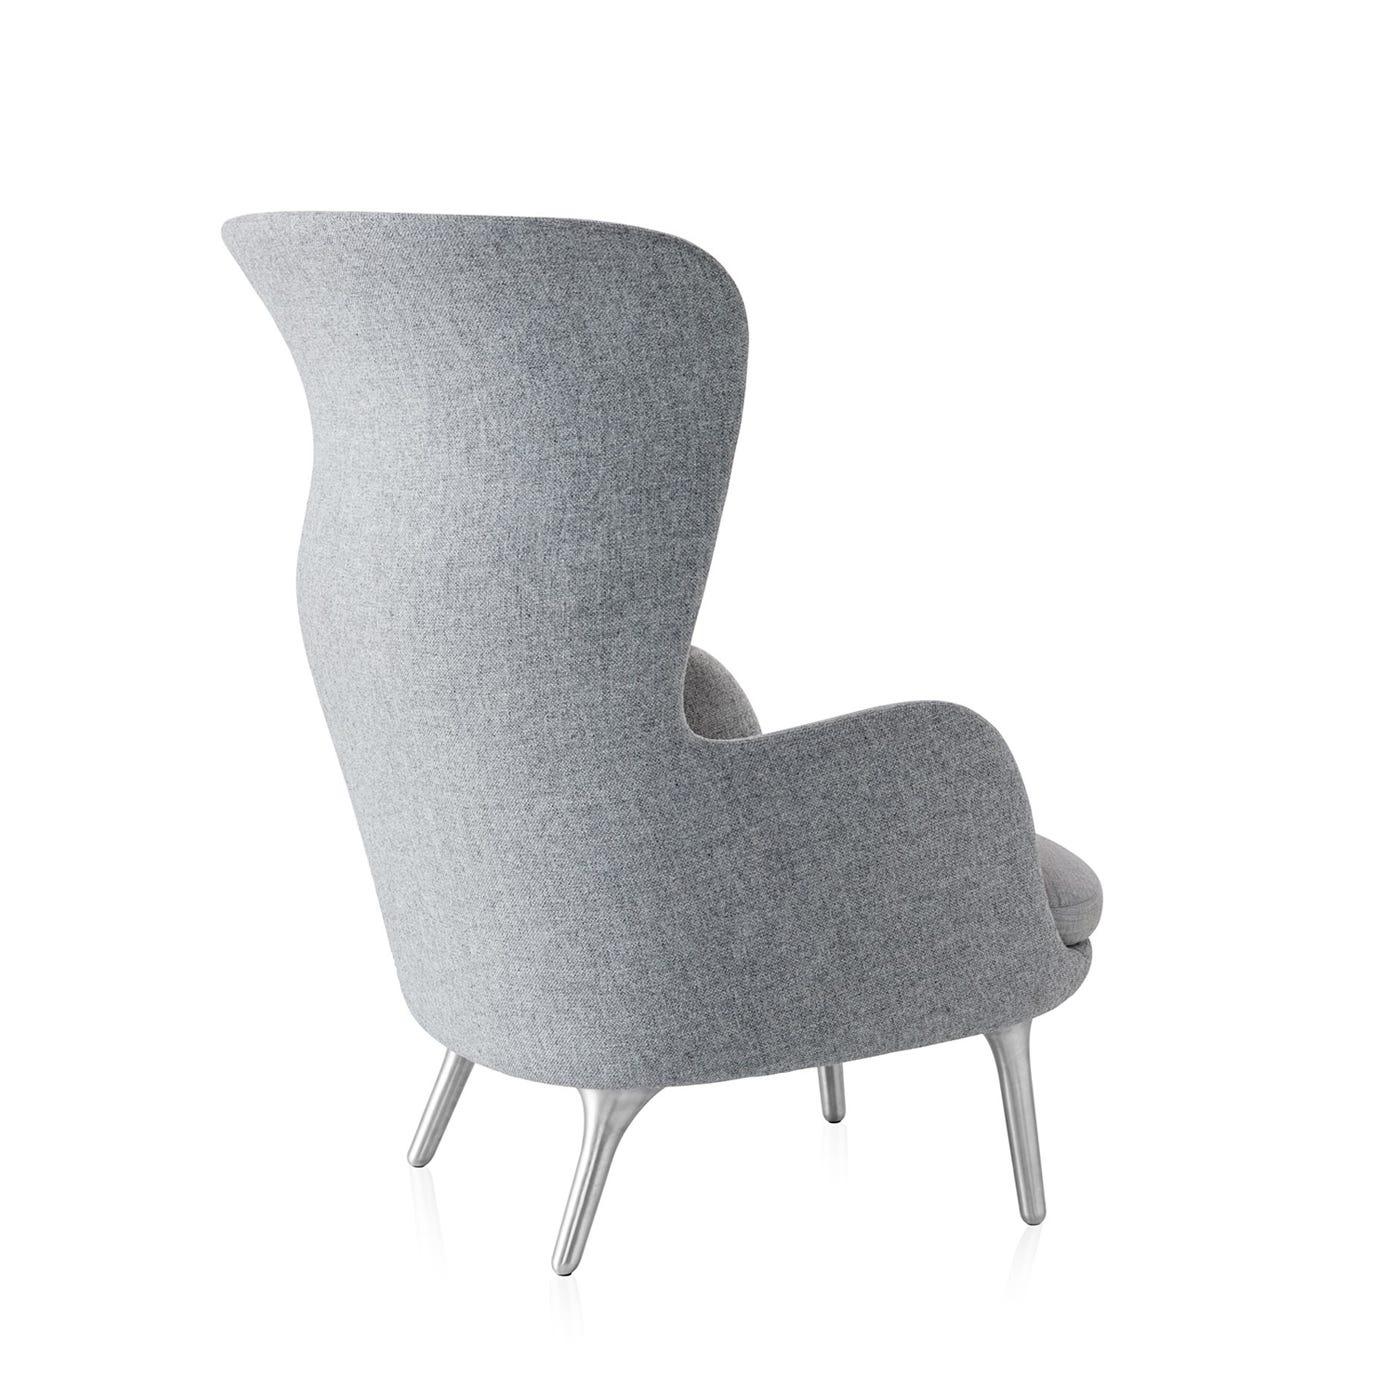 Ro Easy Chair Light Grey With Aluminium Legs